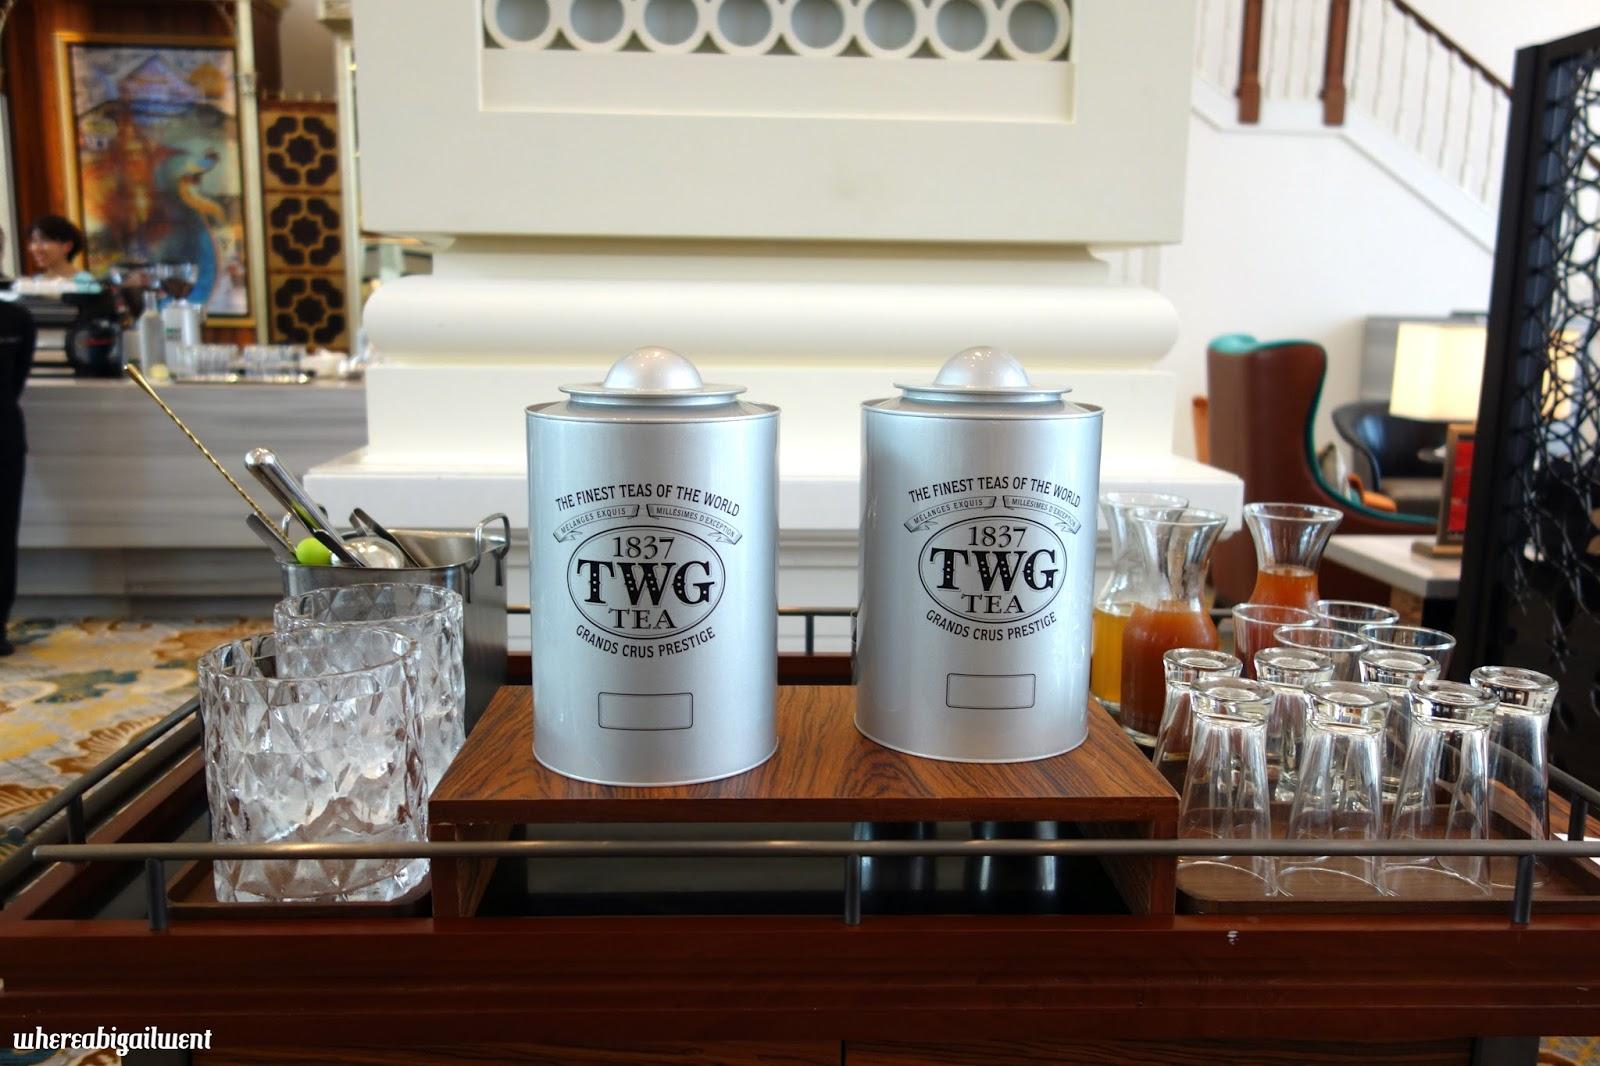 TWG Afternoon Tea Intercontinental Singapore